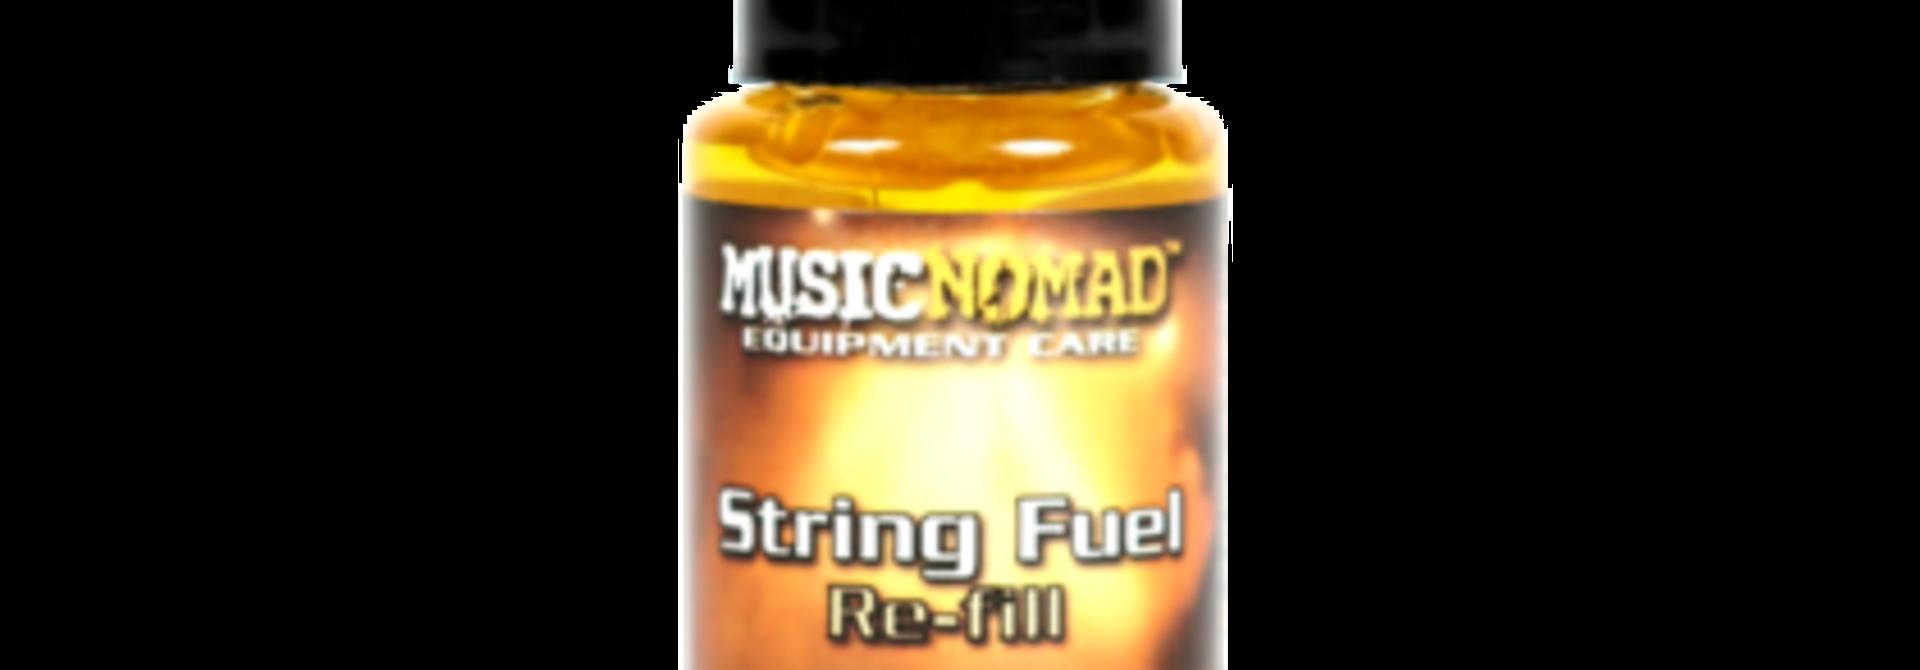 Music Nomad String Fuel Refill .5 oz MN120